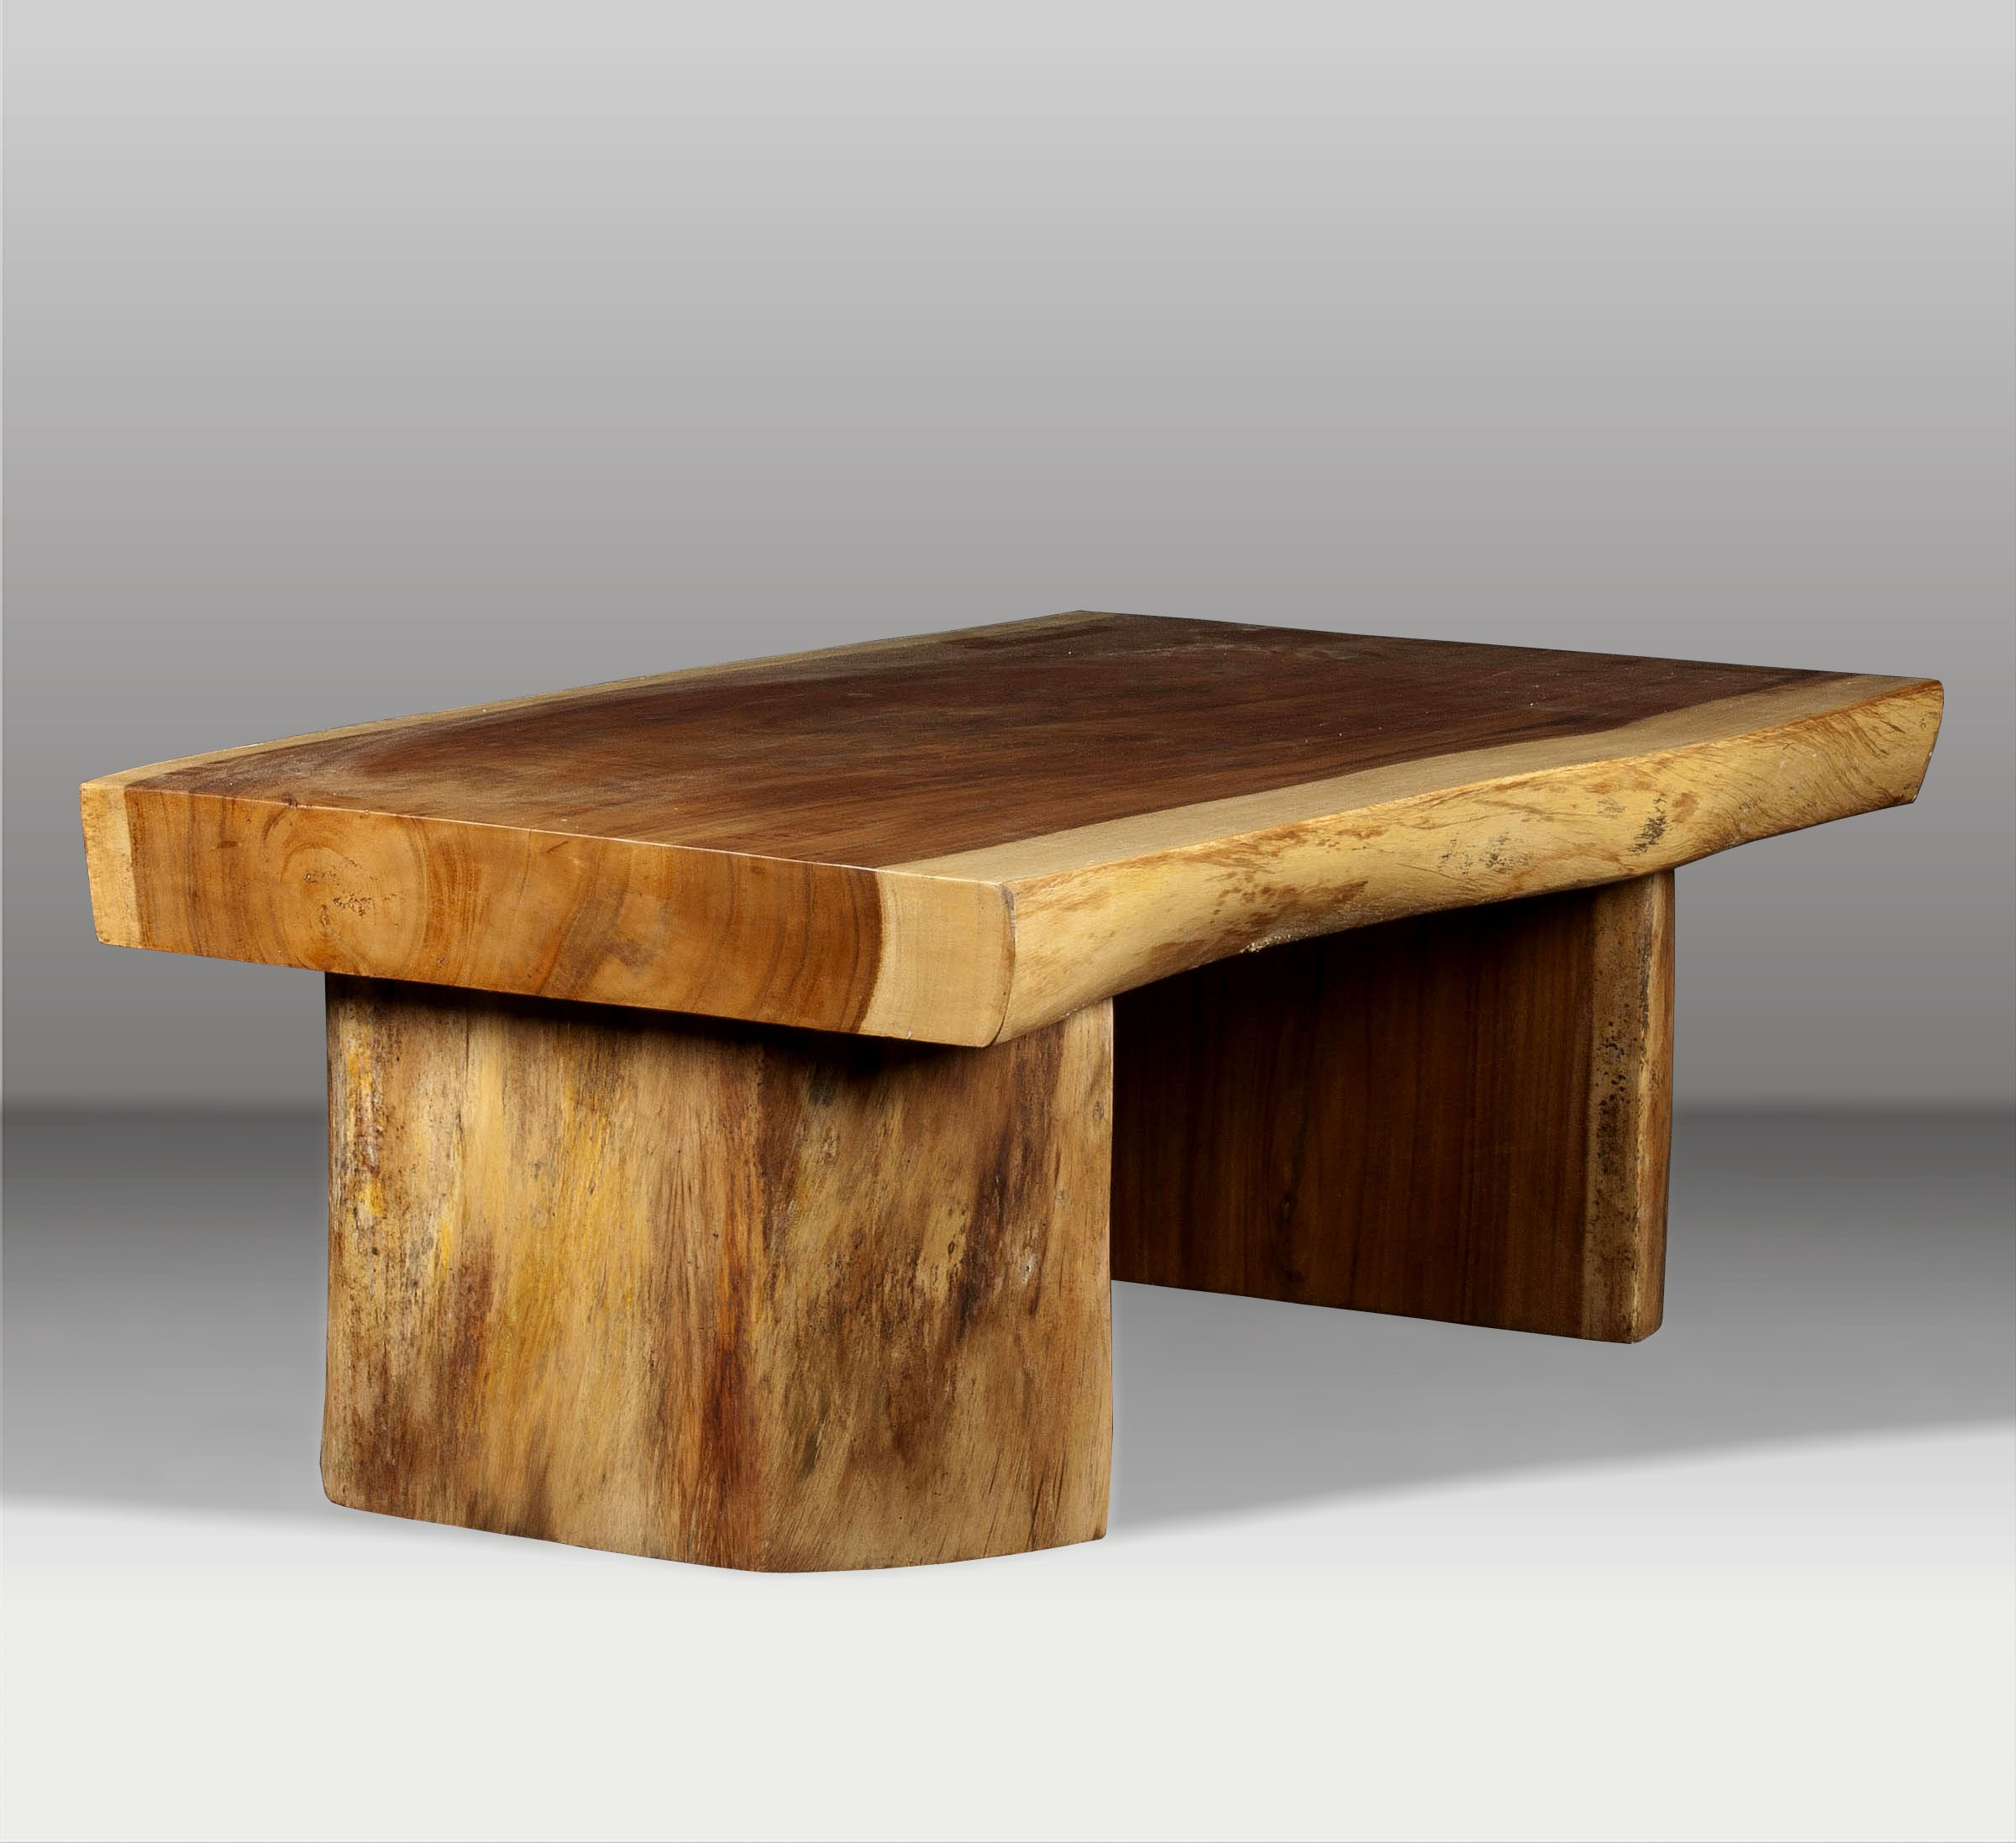 Mesa de centro y mesa de madera batavia - Mesas de troncos de madera ...